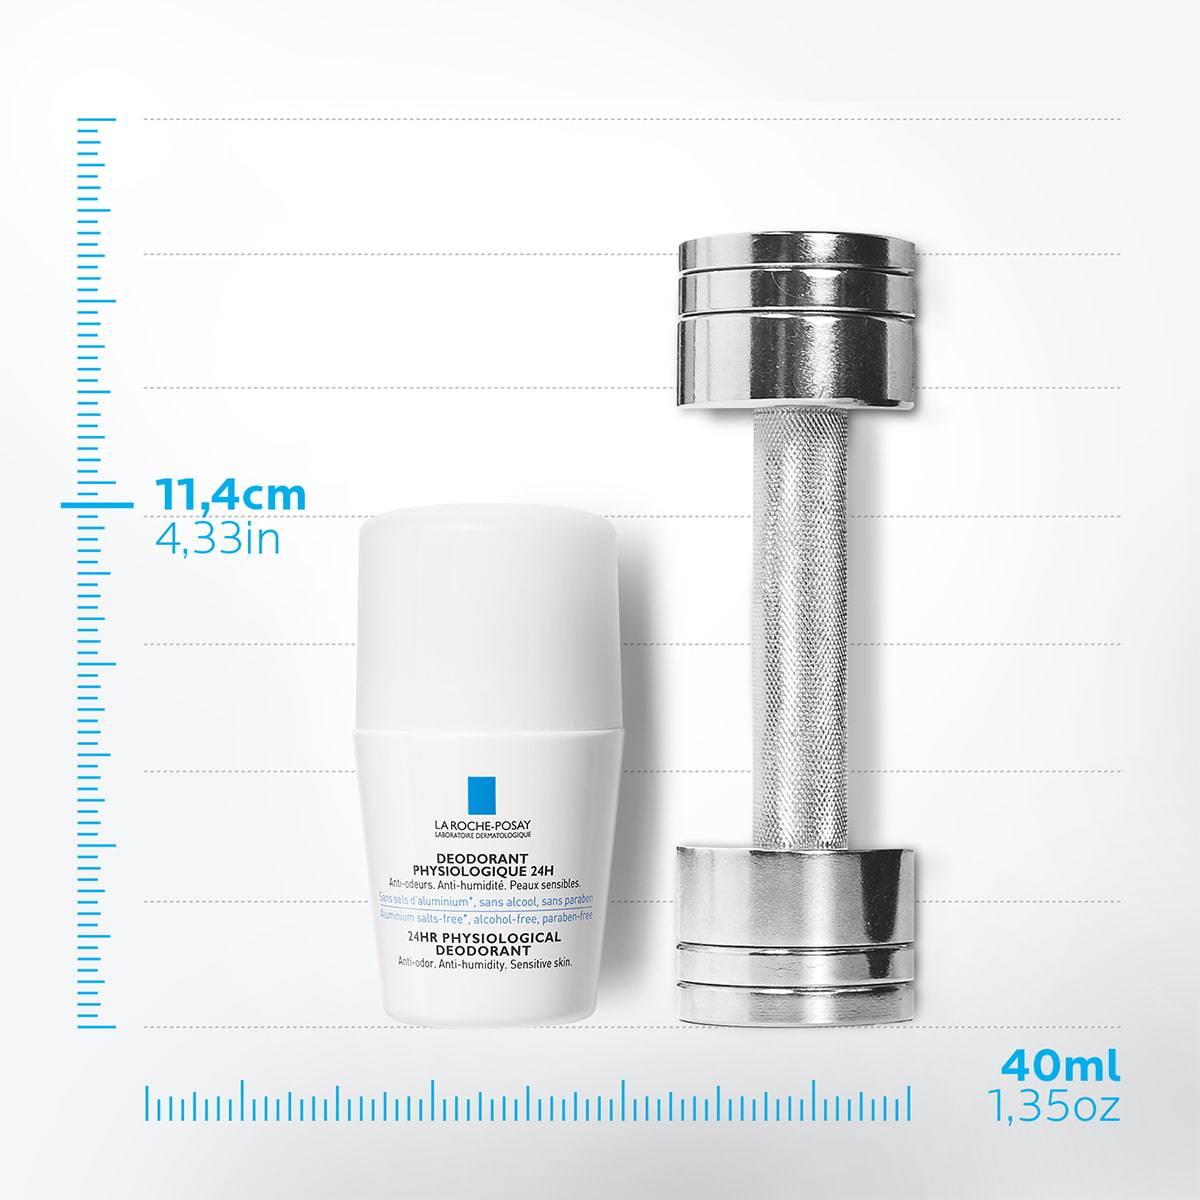 La Roche Posay StránkaProduktu Fyziologický deodorant Roll-on 24h 50ml 33